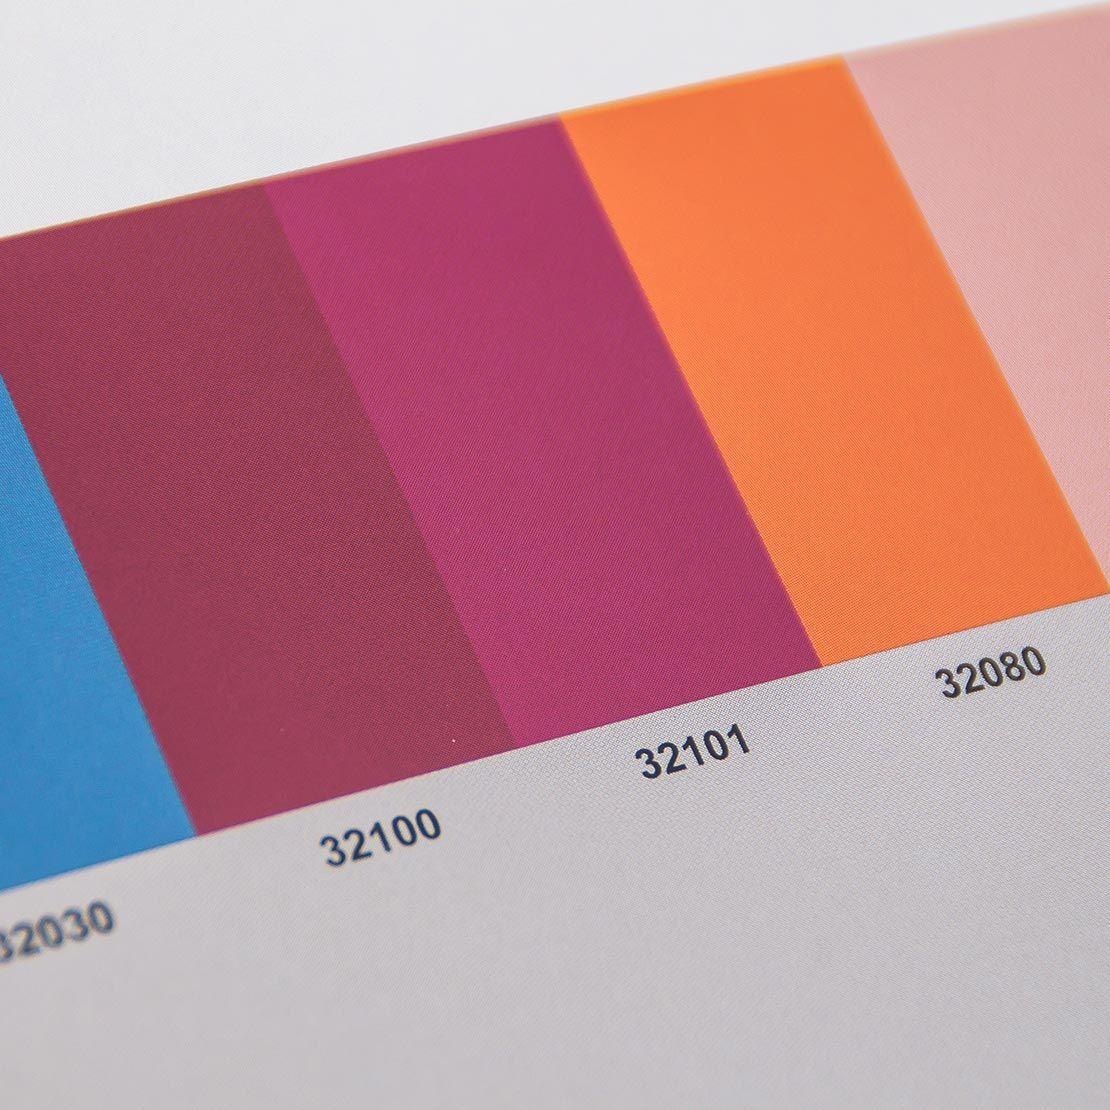 Scandinavian Interiordesign Colors: Le Corbusier's Colour Keyboards